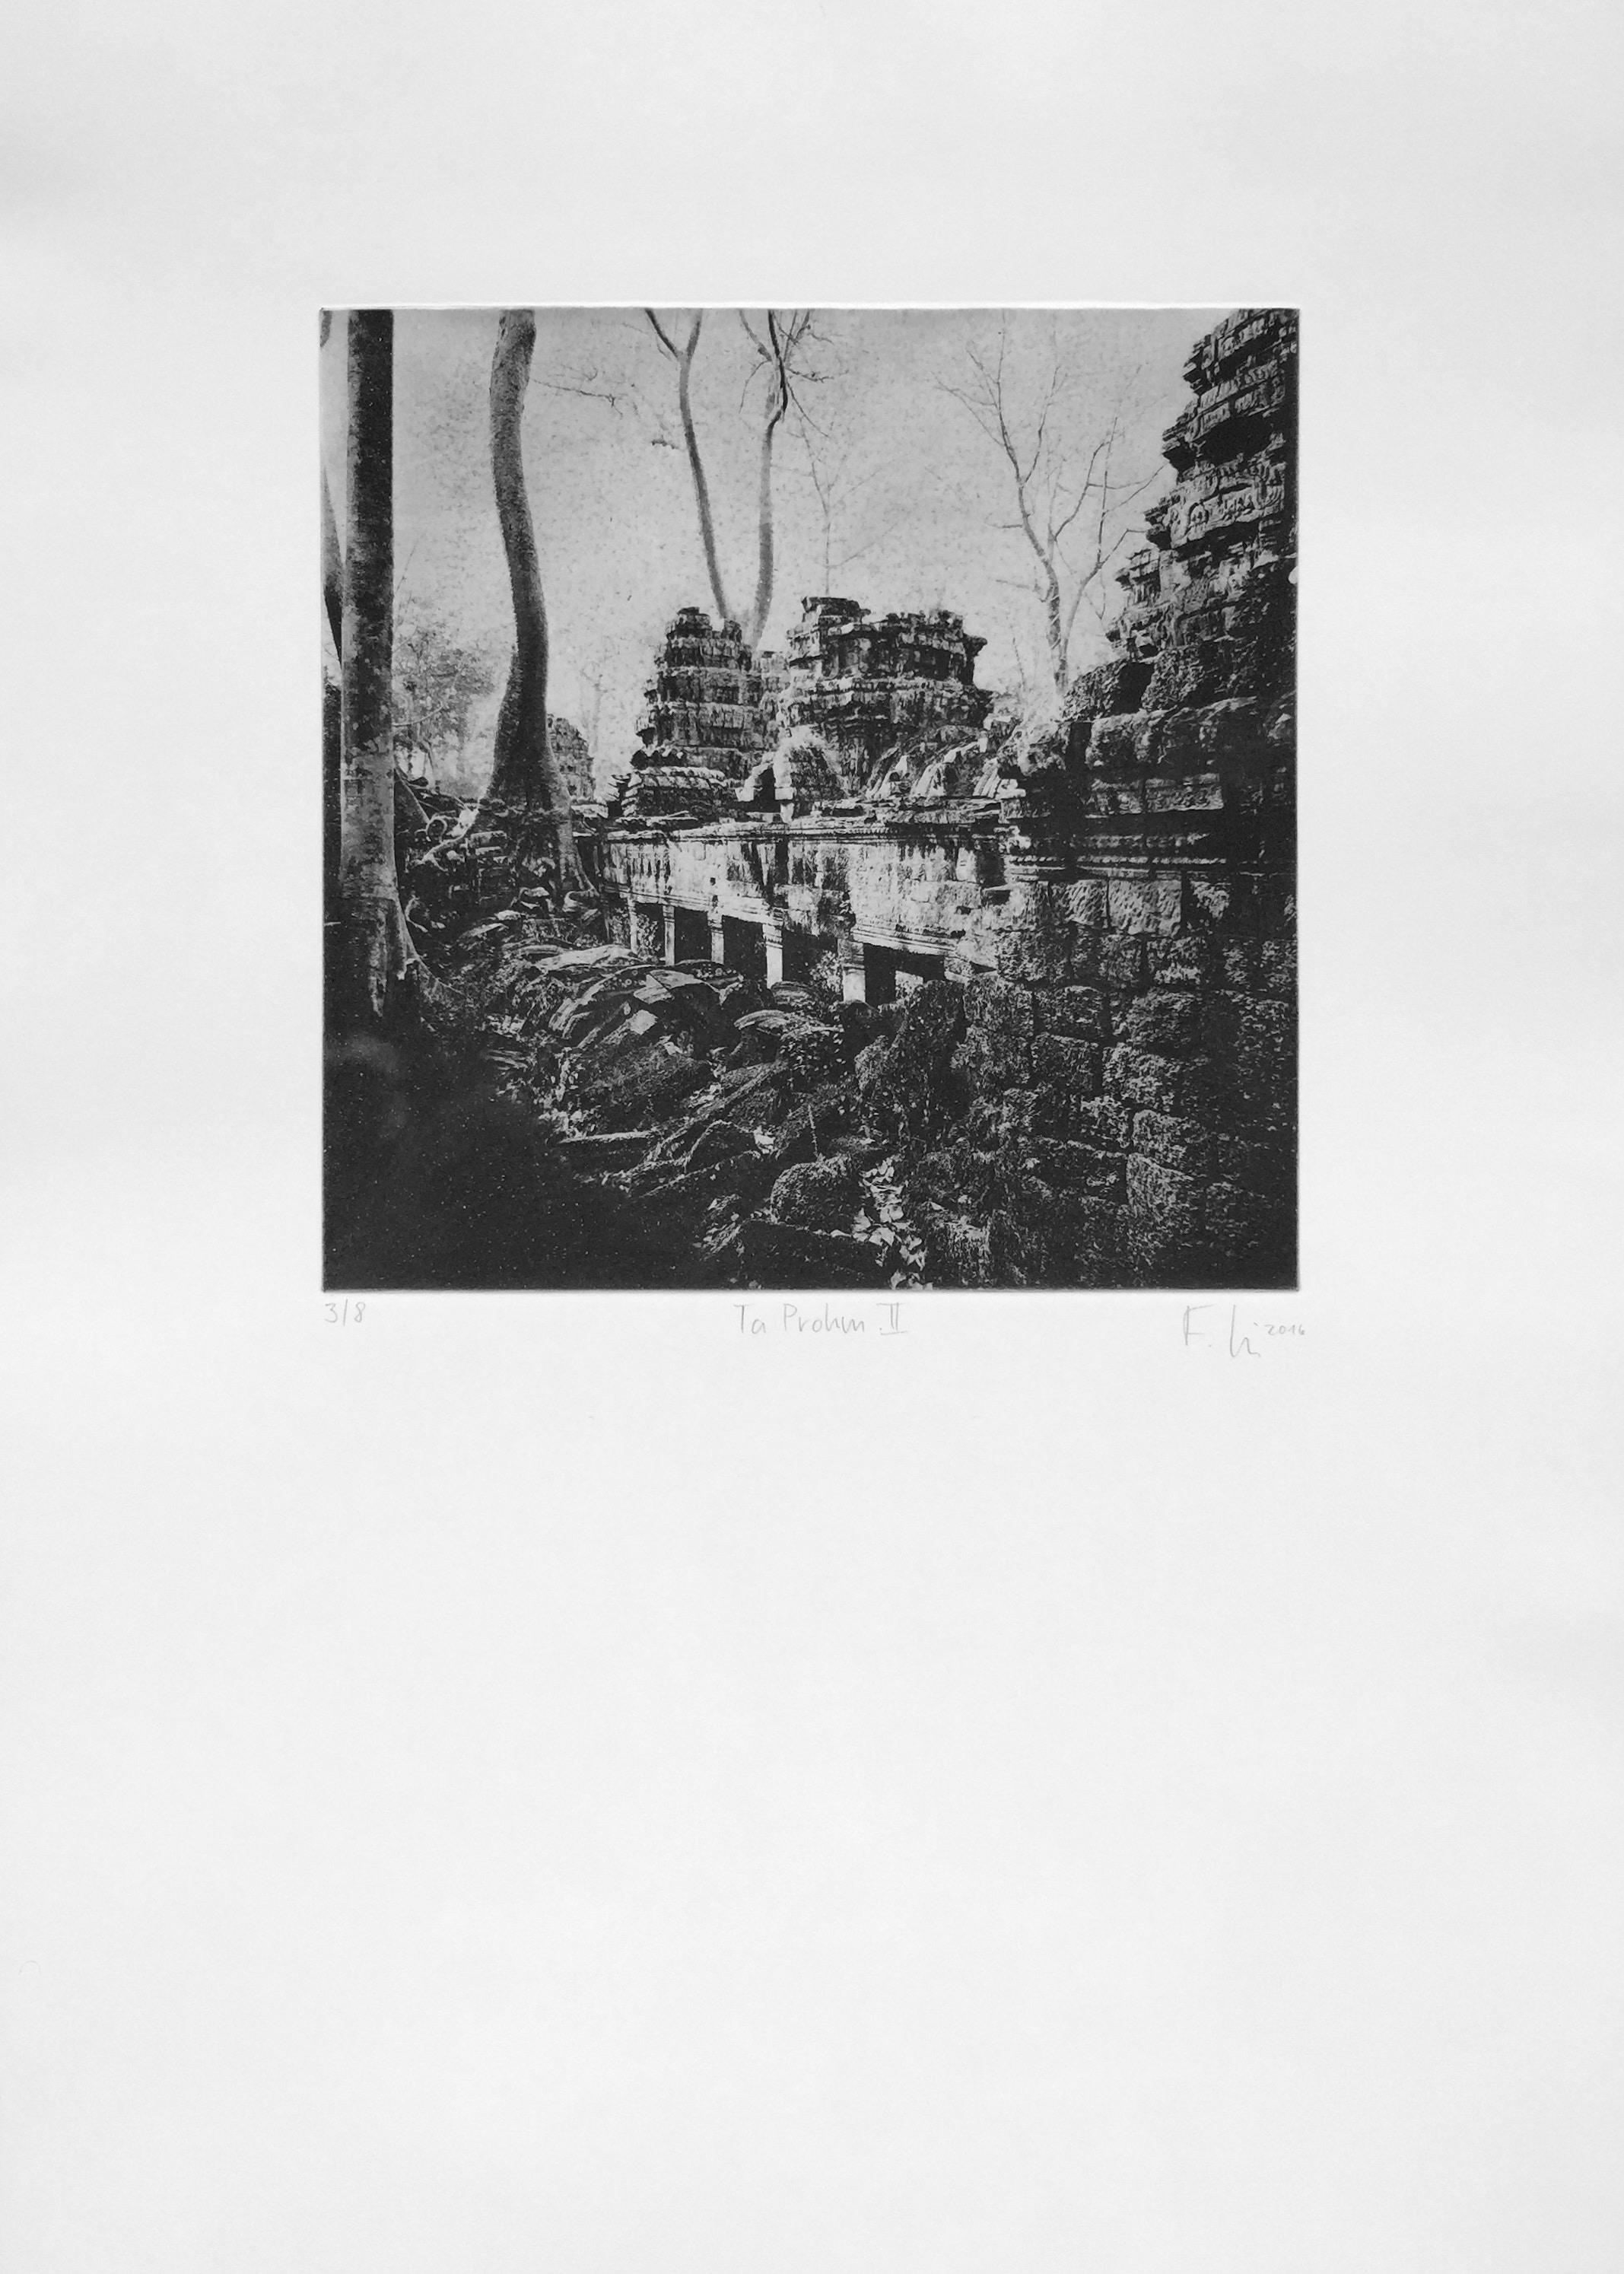 Ta Prohm II (2016)  medium: Heliogravüre  size: 50 x 70 cm  paper: Zerkall 250 g/qm  plate: 30 x 30 cm  edition:12 copies  numbered: 1/8 - 8/8, 4 e.a.  printer: FWU